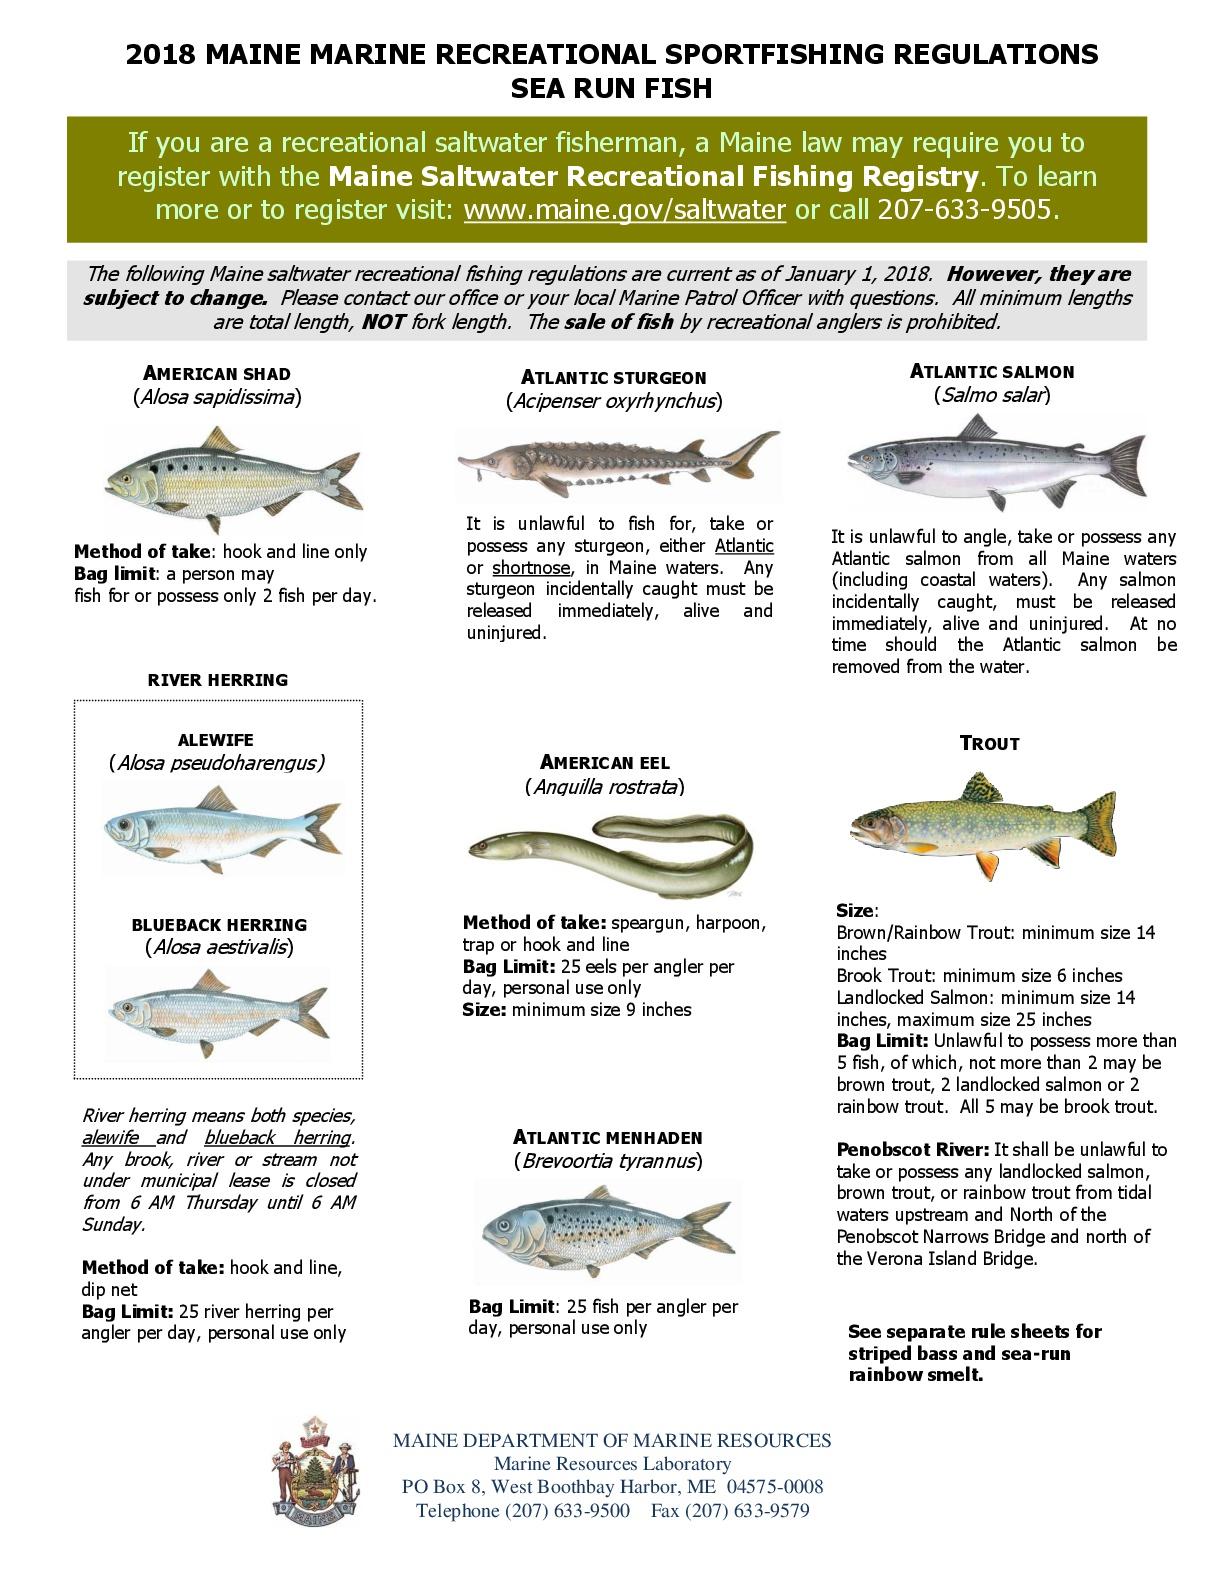 DMR Searun Sportfish Regulations 2018.jpg